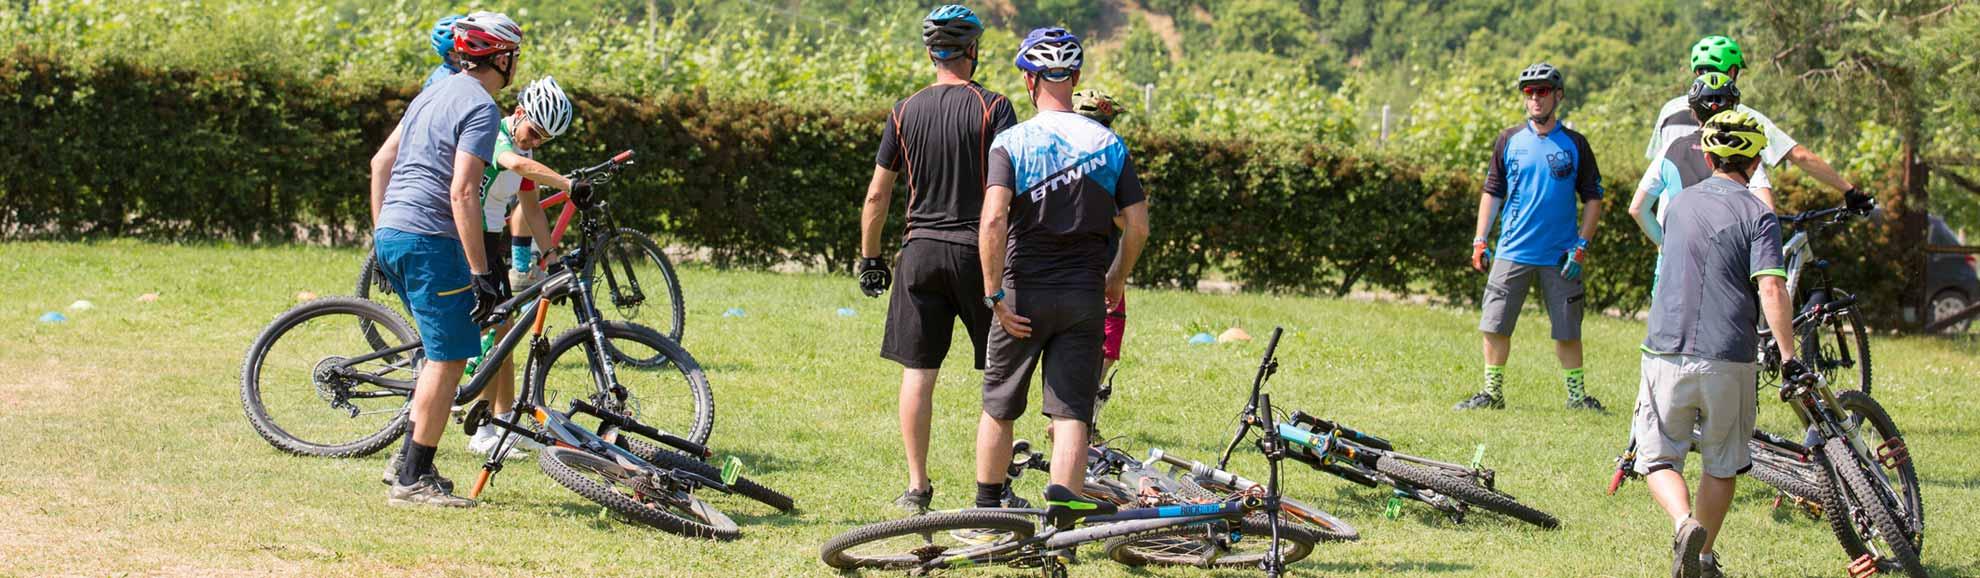 Mtb trails bike Langhe Roero